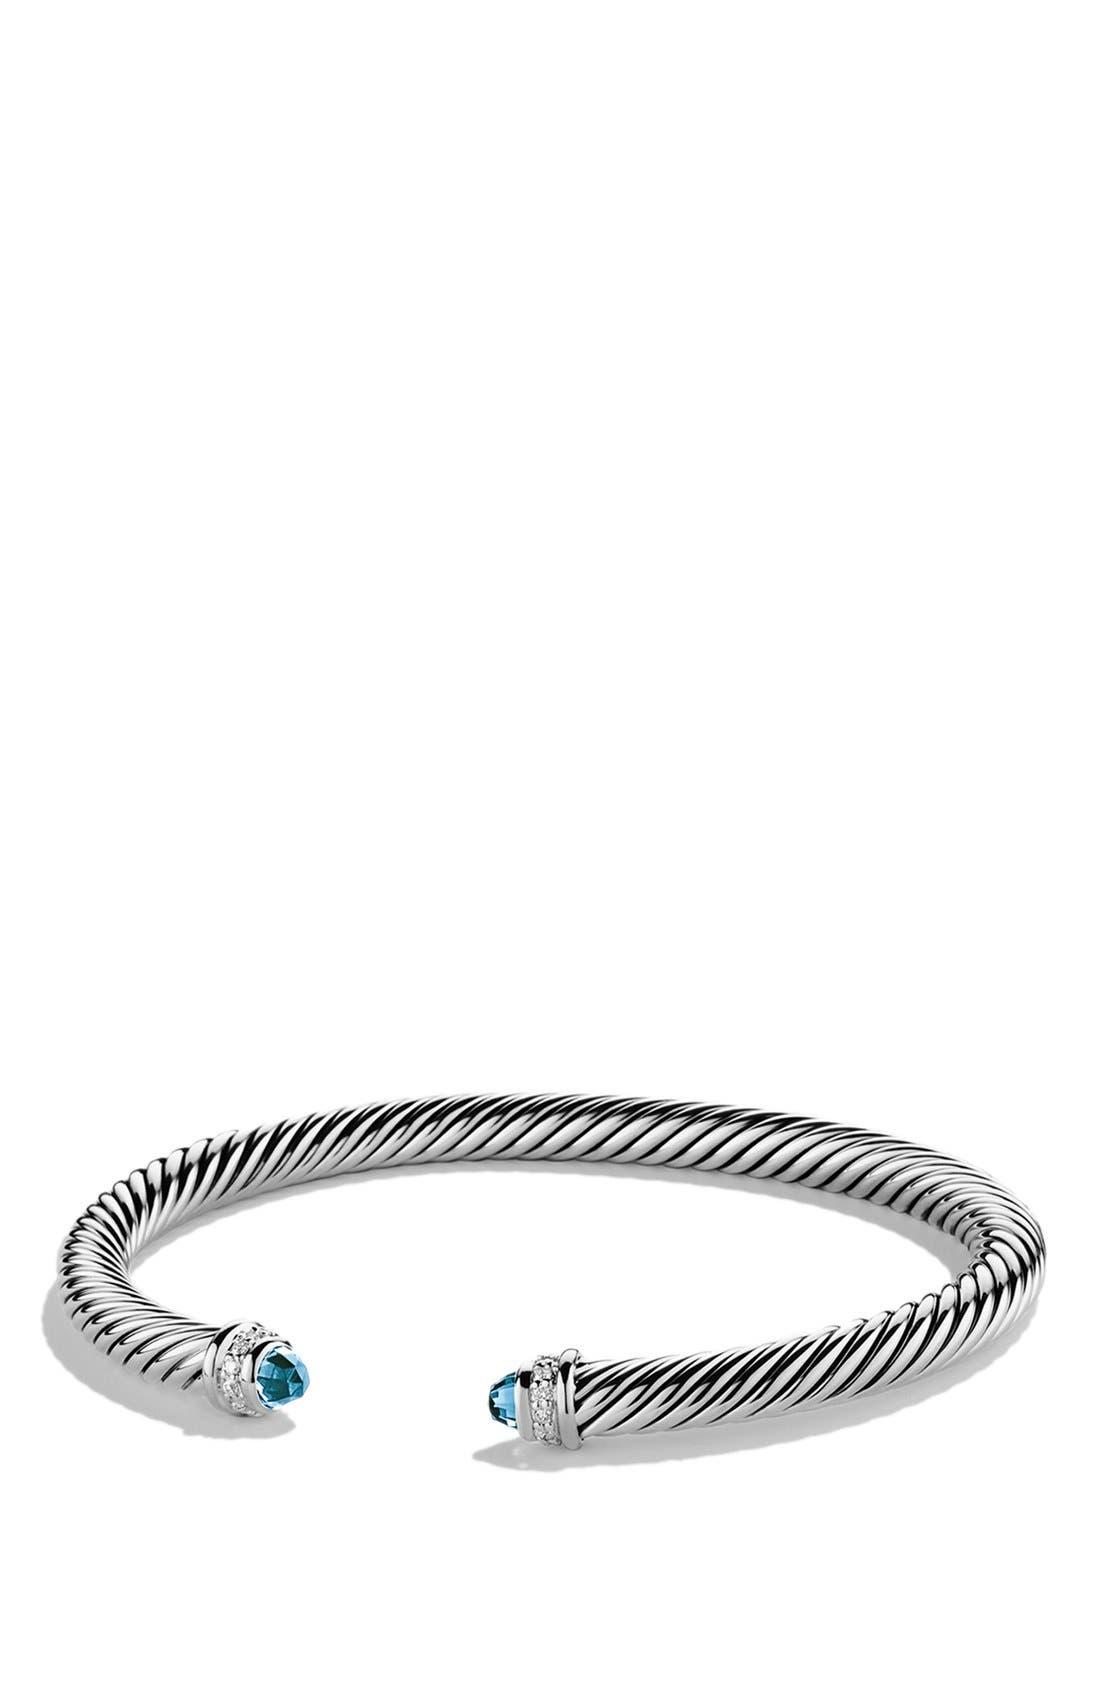 Cable Classics Bracelet with Semiprecious Stones & Diamonds, 5mm, Main, color, BLUE TOPAZ